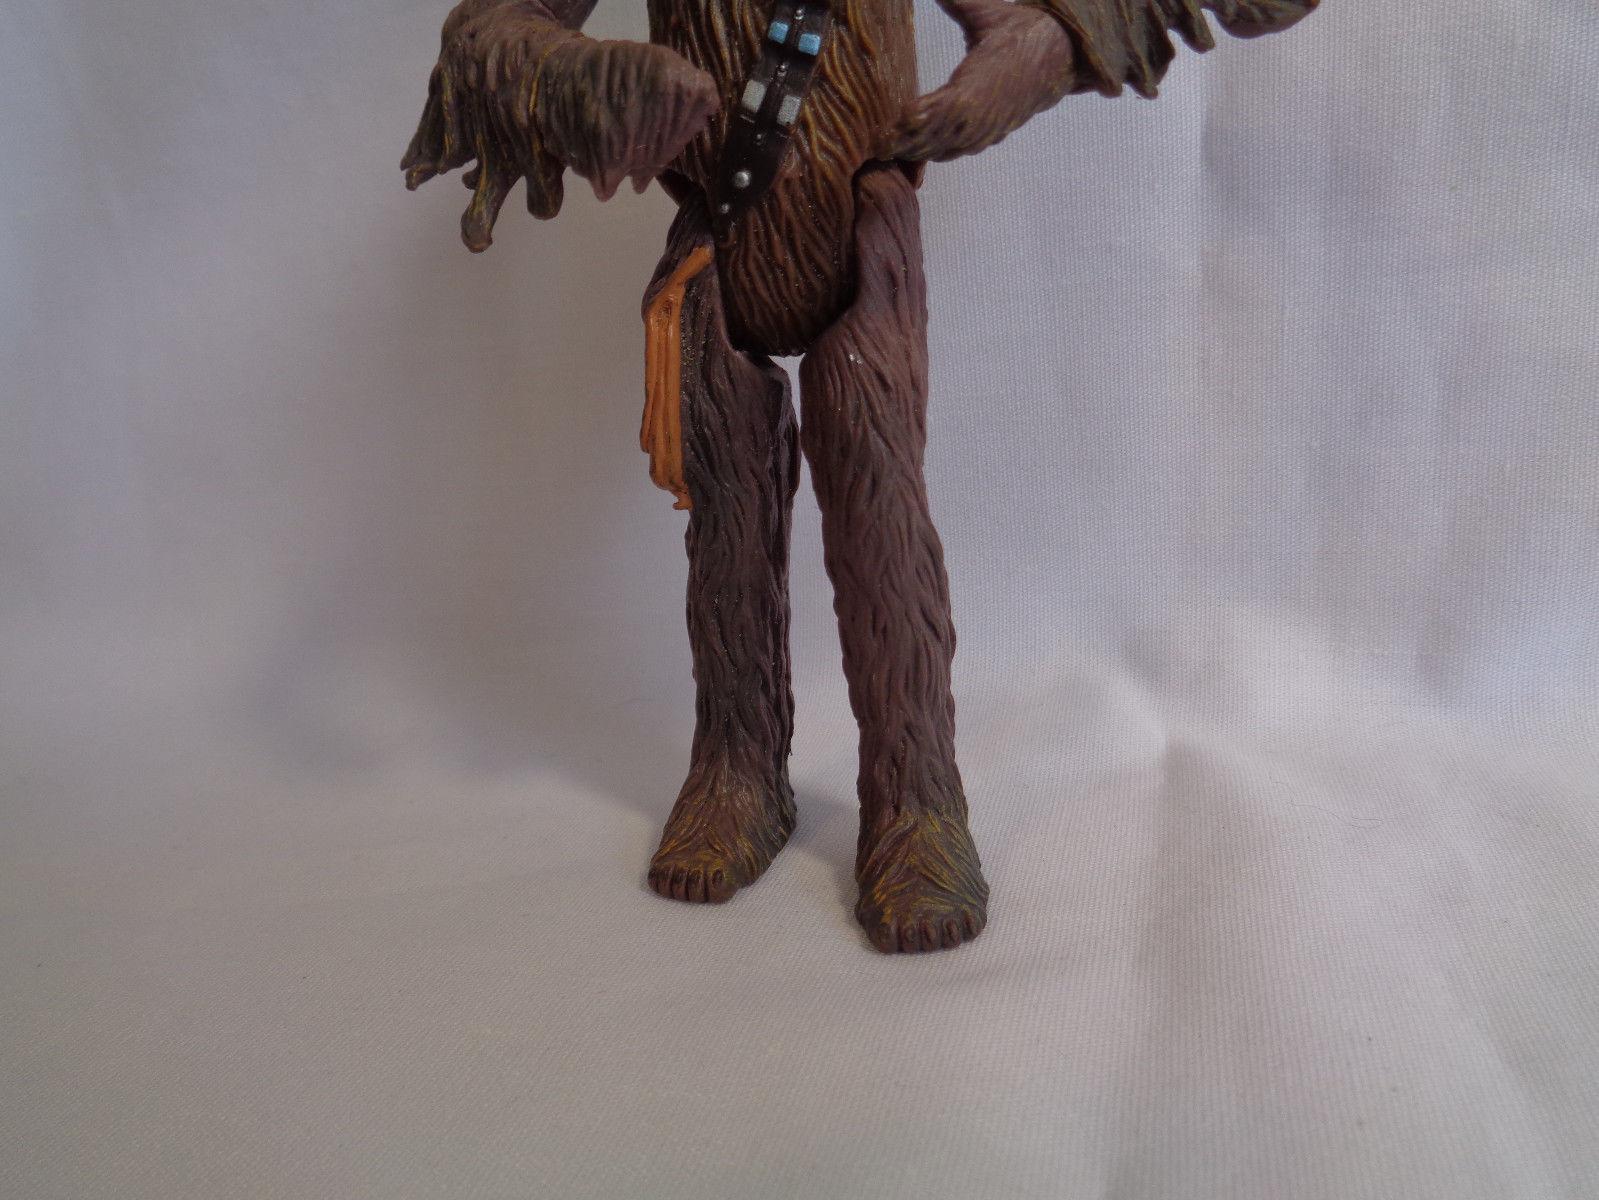 2001 Hasbro Star Wars Chewbacca Action Figure image 3